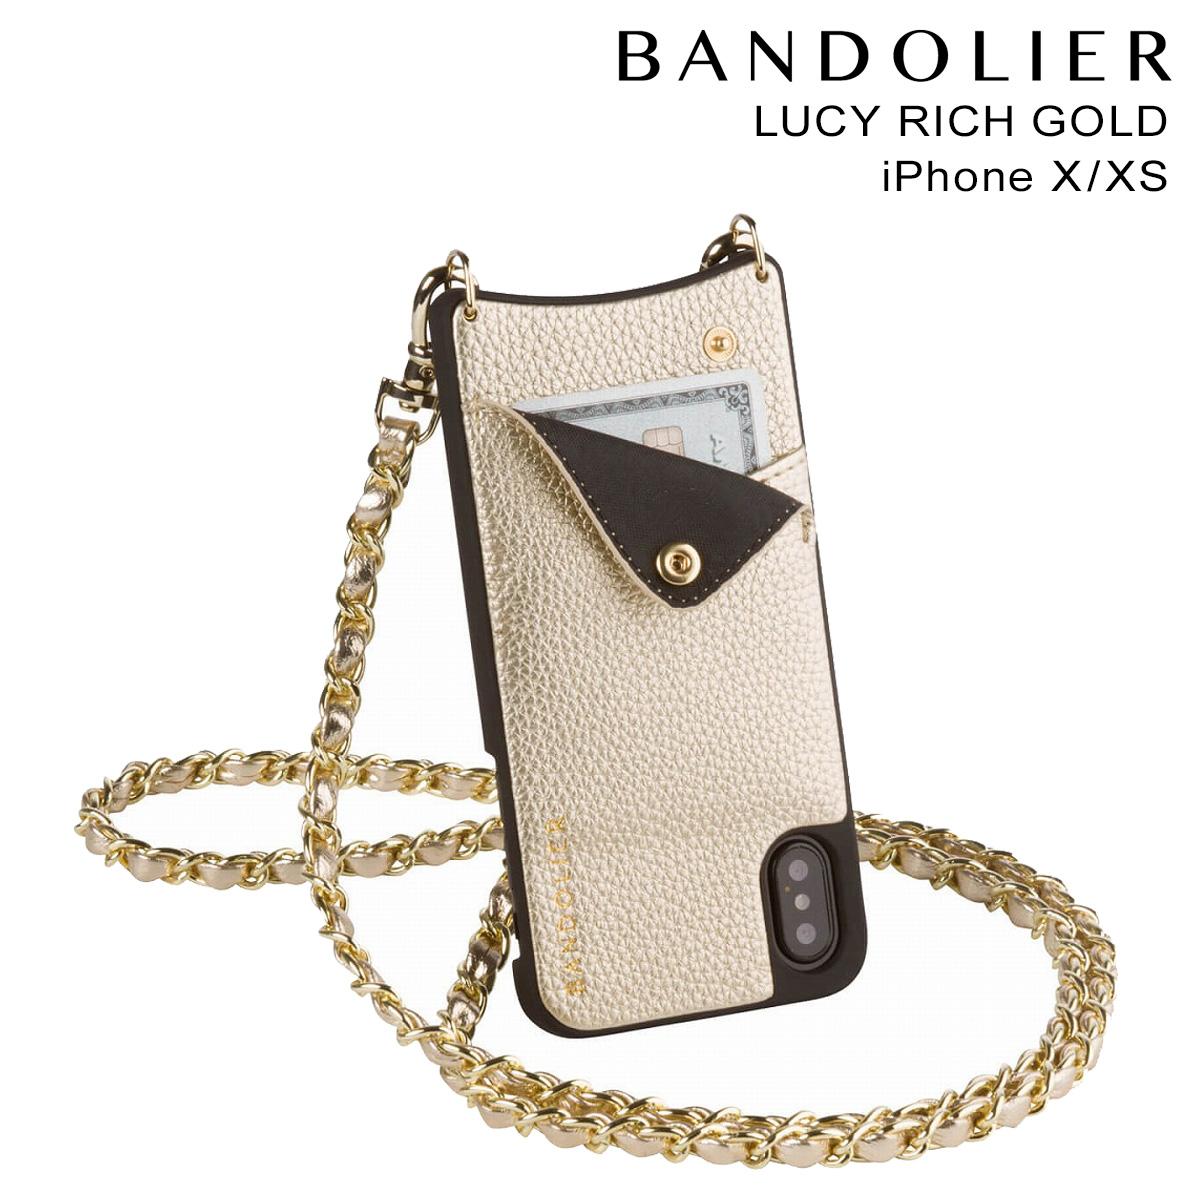 BANDOLIER LUCY RICH GOLD バンドリヤー iPhoneXS X ケース スマホ アイフォン レザー メンズ レディース